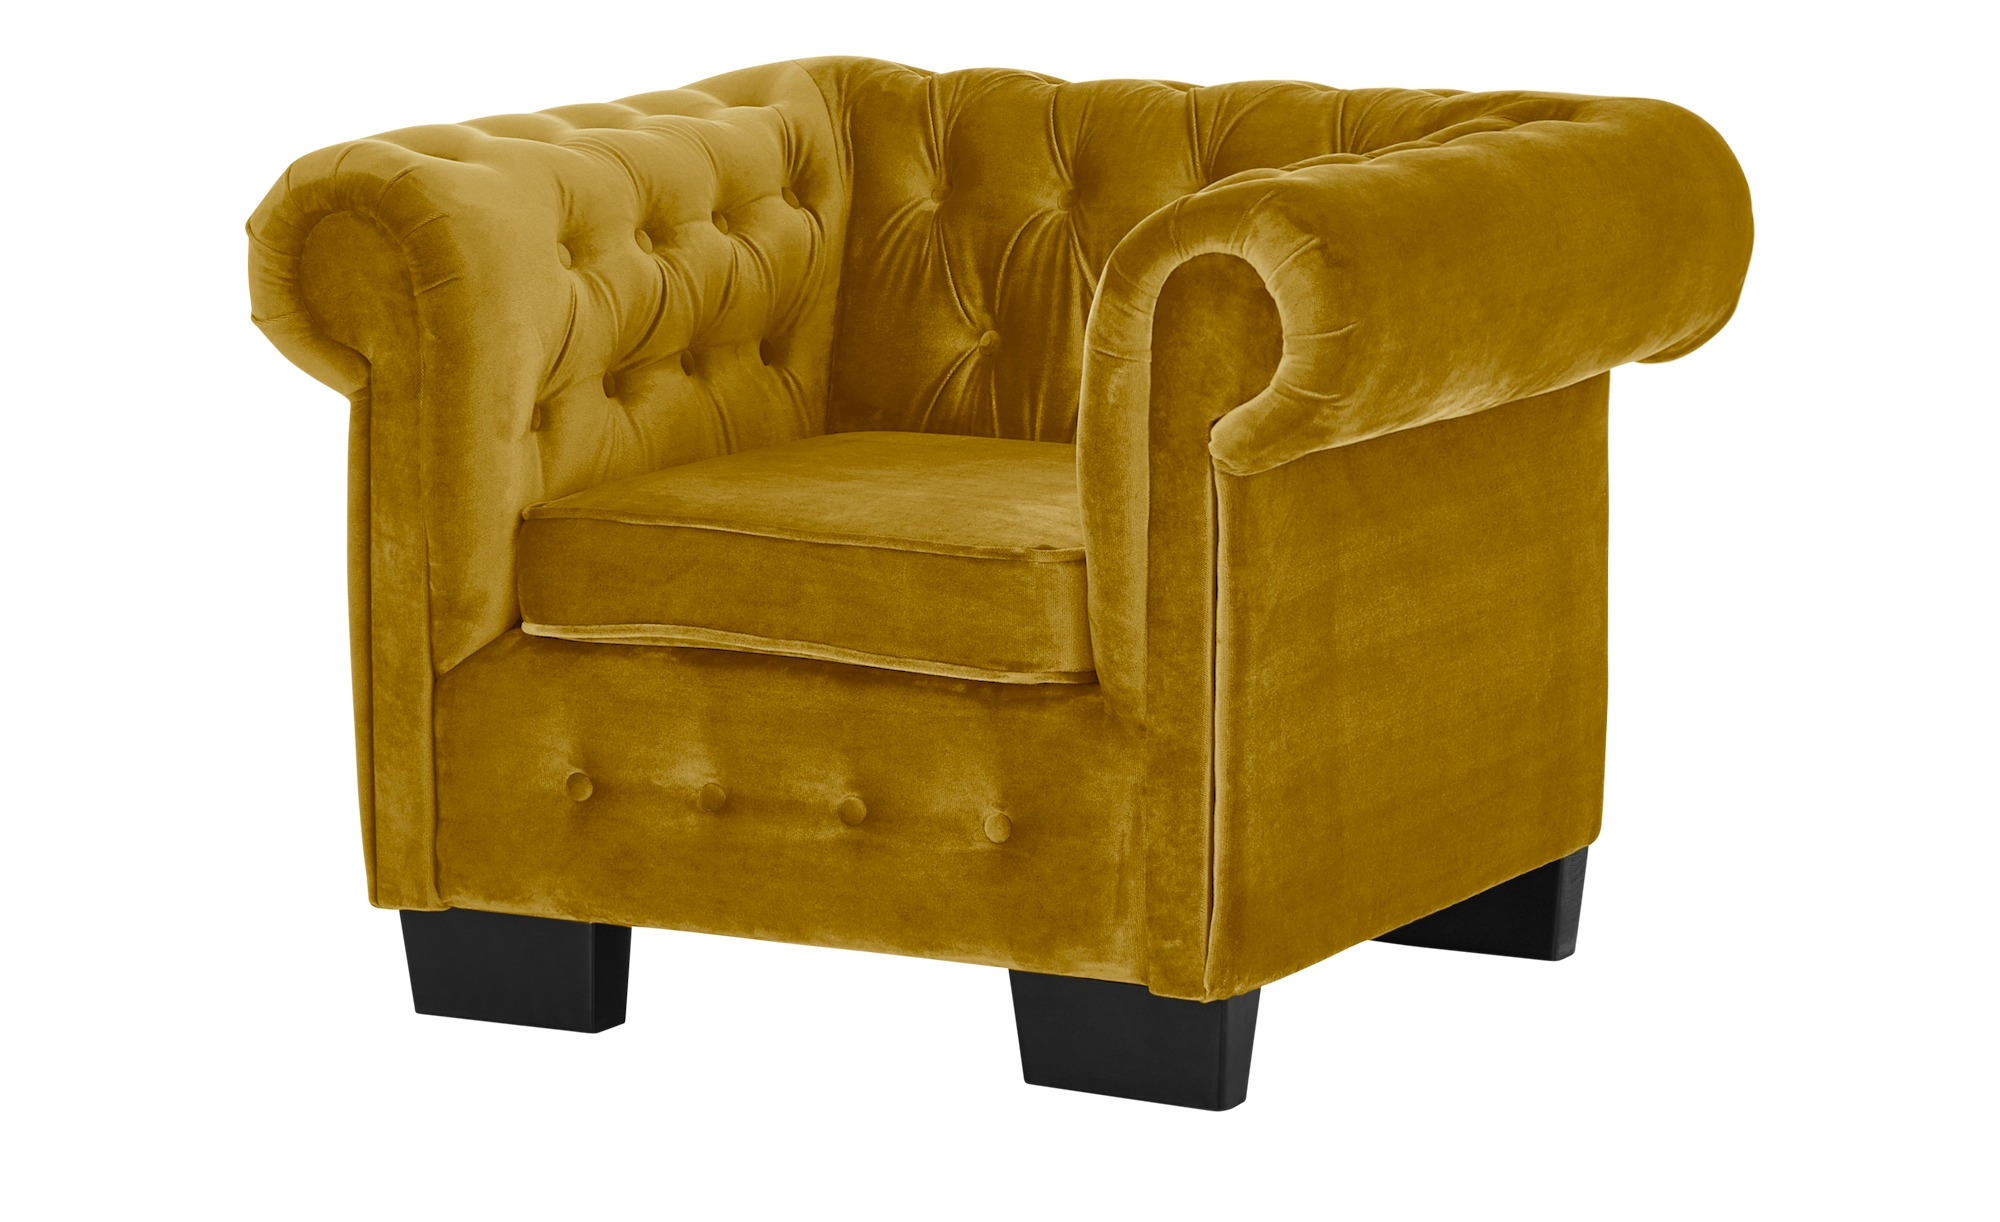 smart Sessel  Chelli ¦ gelb ¦ Maße (cm): B: 102 H: 75 T: 89 Polstermöbel > Sessel > Polstersessel - Höffner